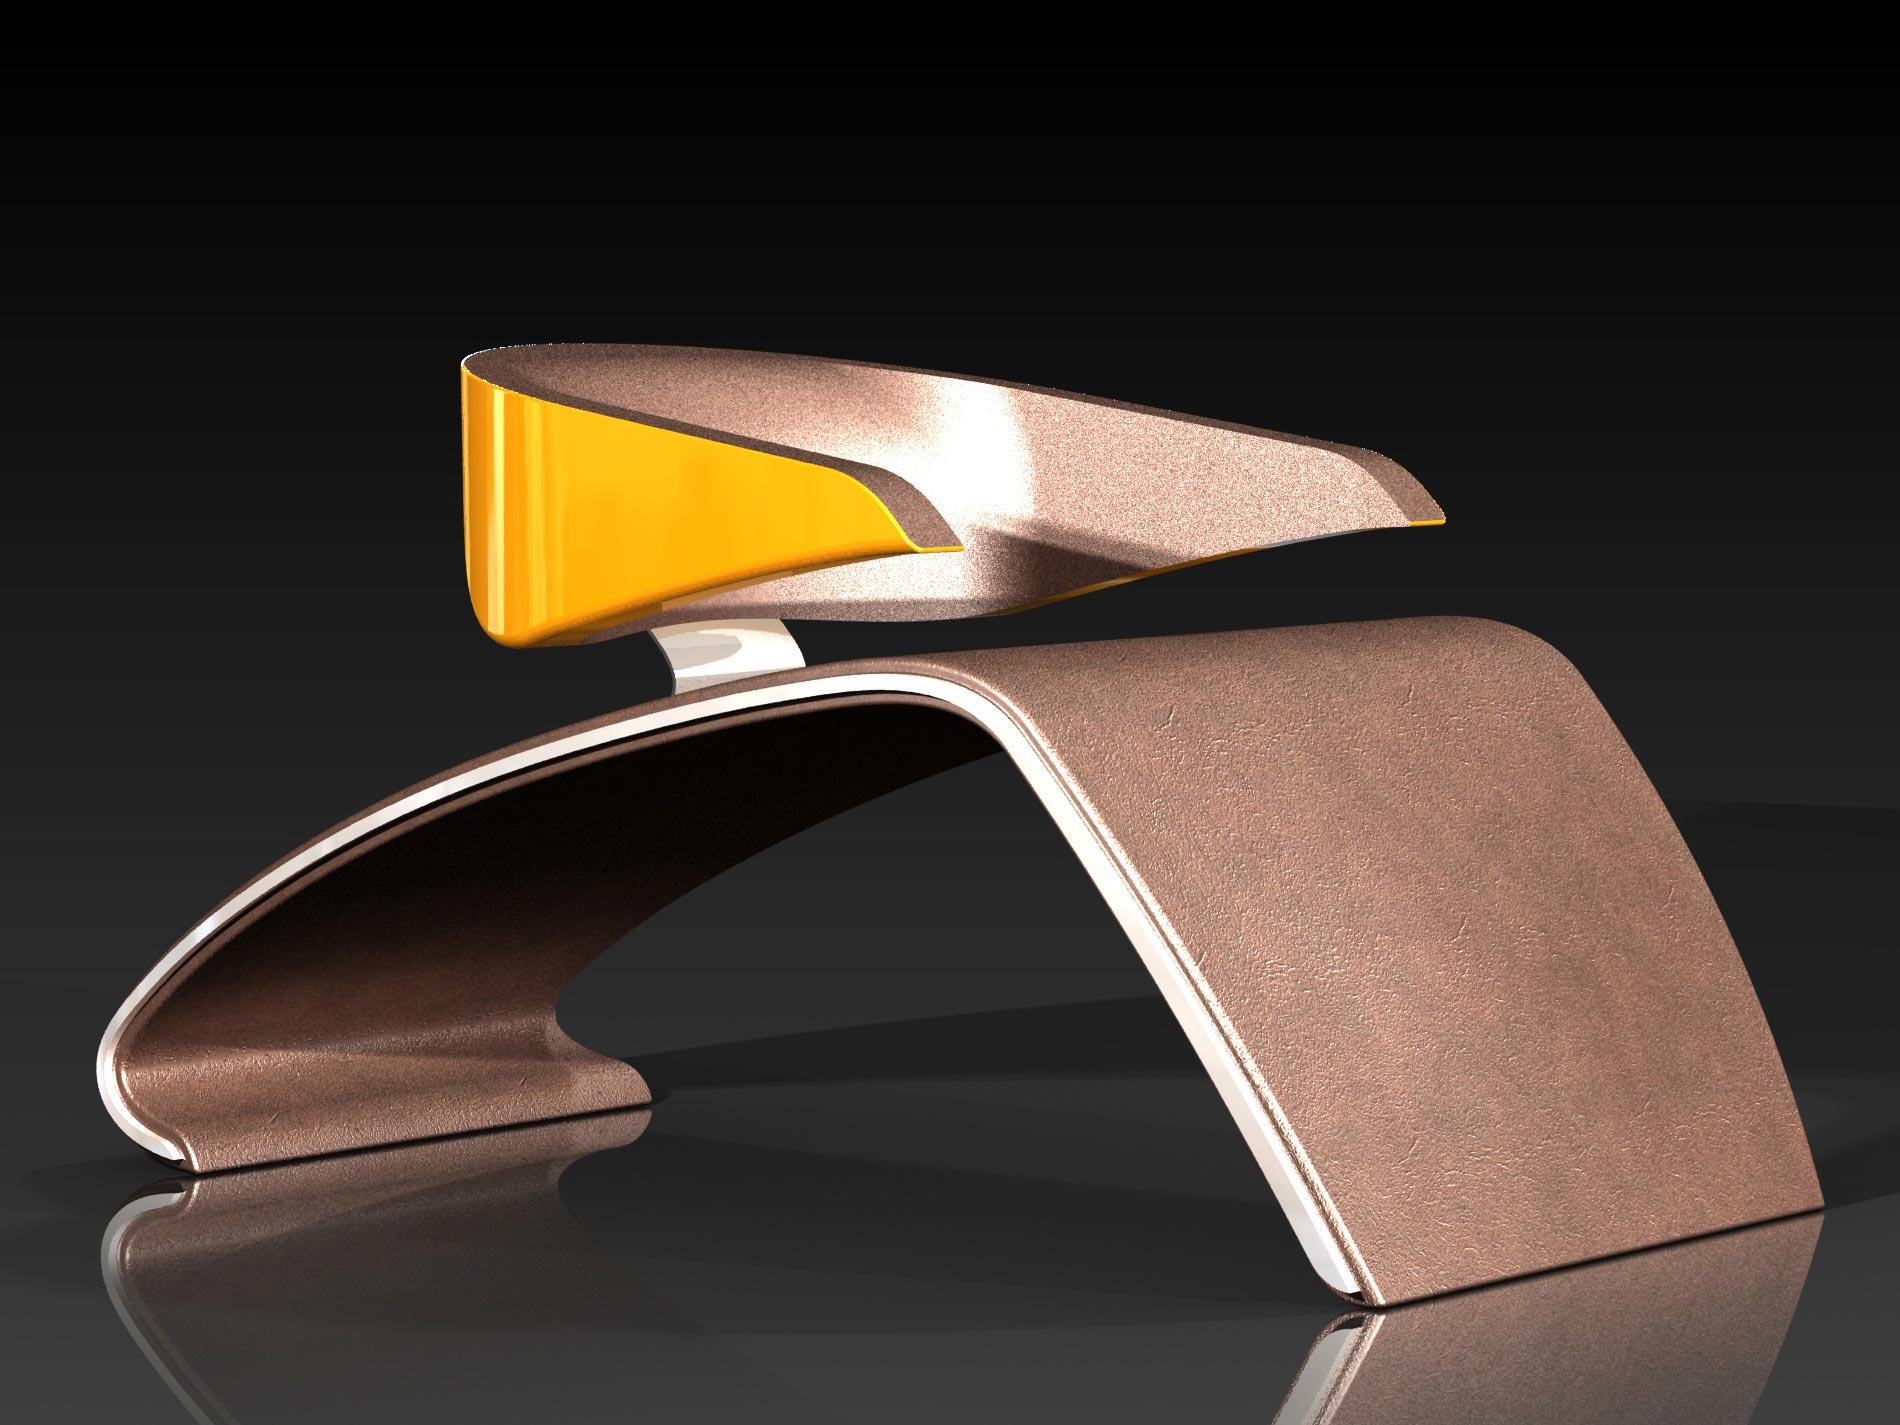 Porsche chair artistic piece of furniture extravaganzi for Artistic furniture design